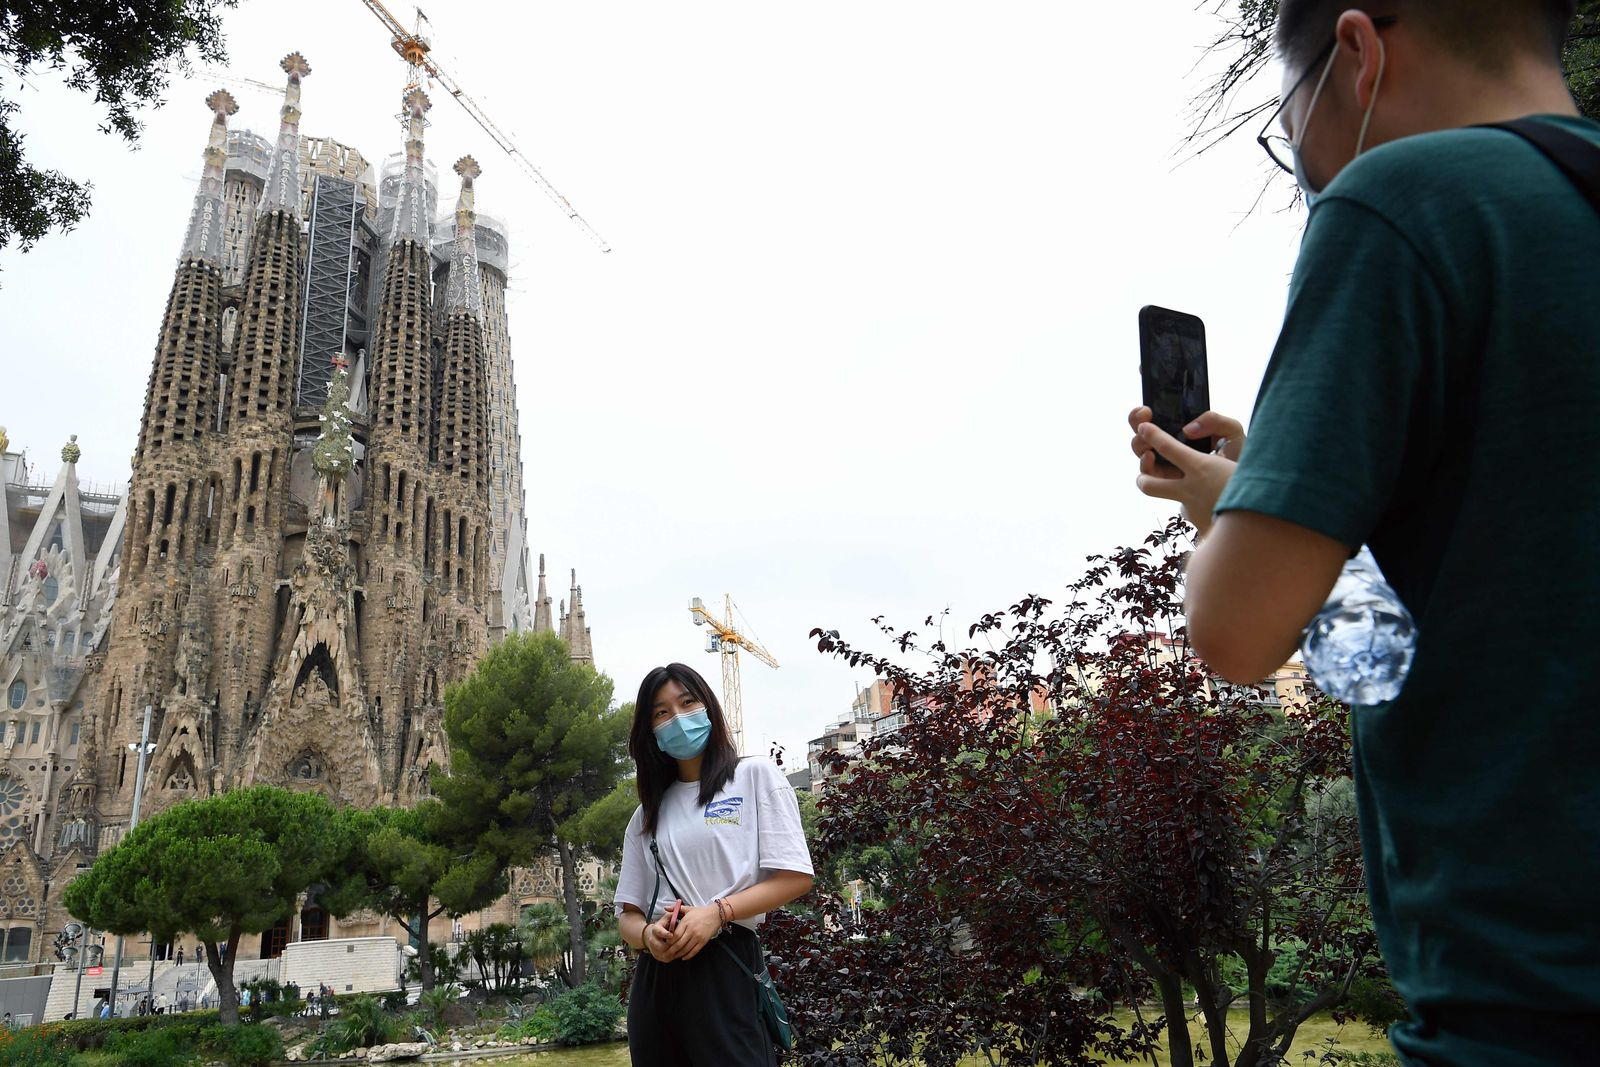 SPAIN-HEALTH-VIRUS-TOURISM-MONUMENT-RELIGION